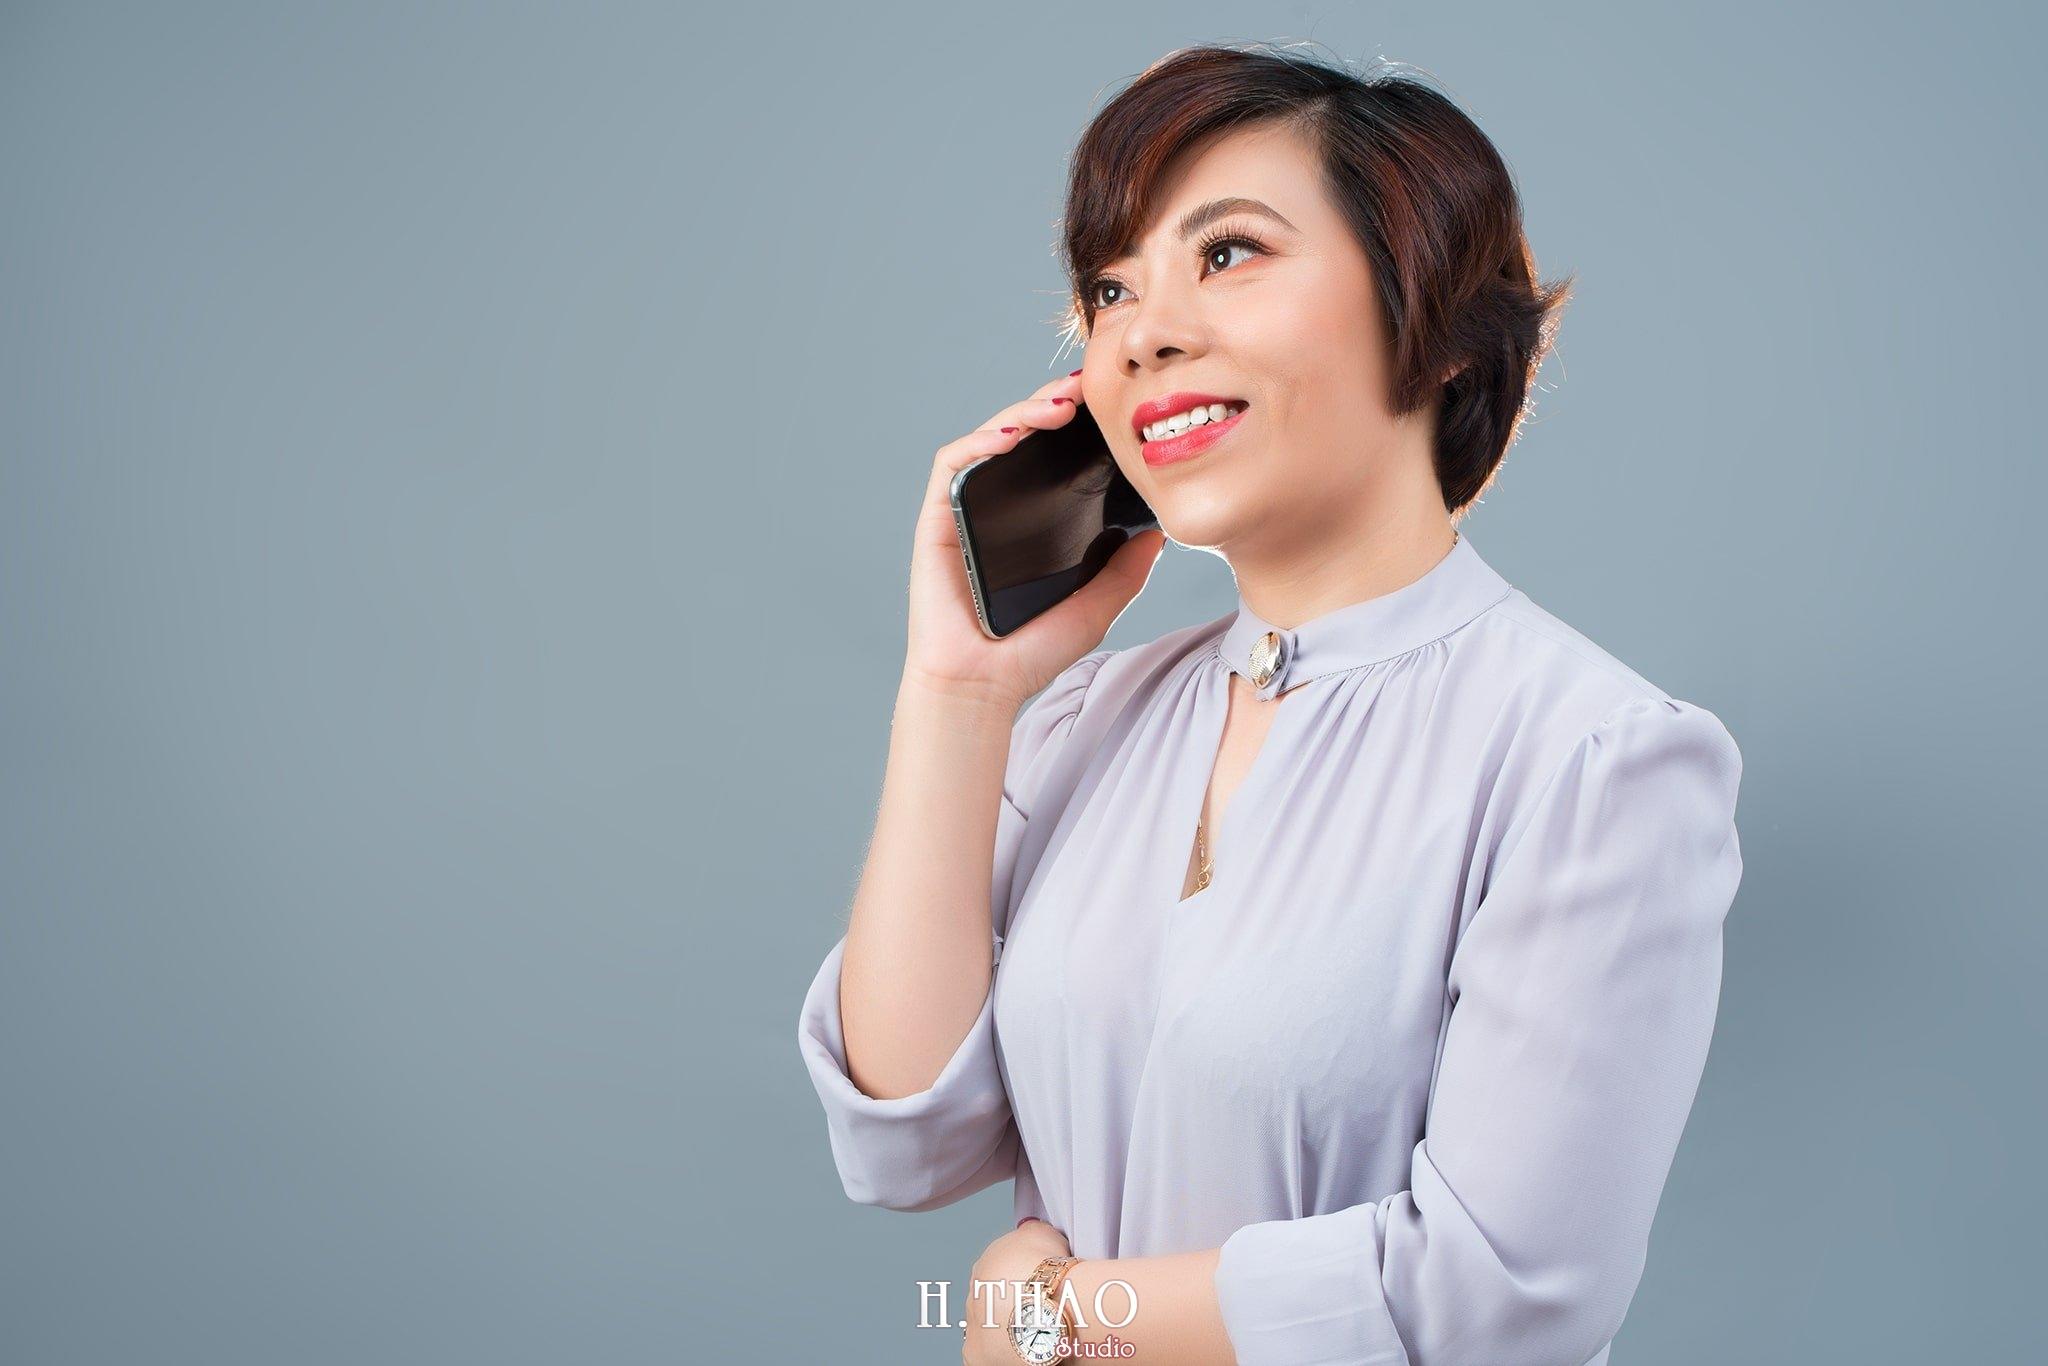 Nữ doanh nhân Phan An